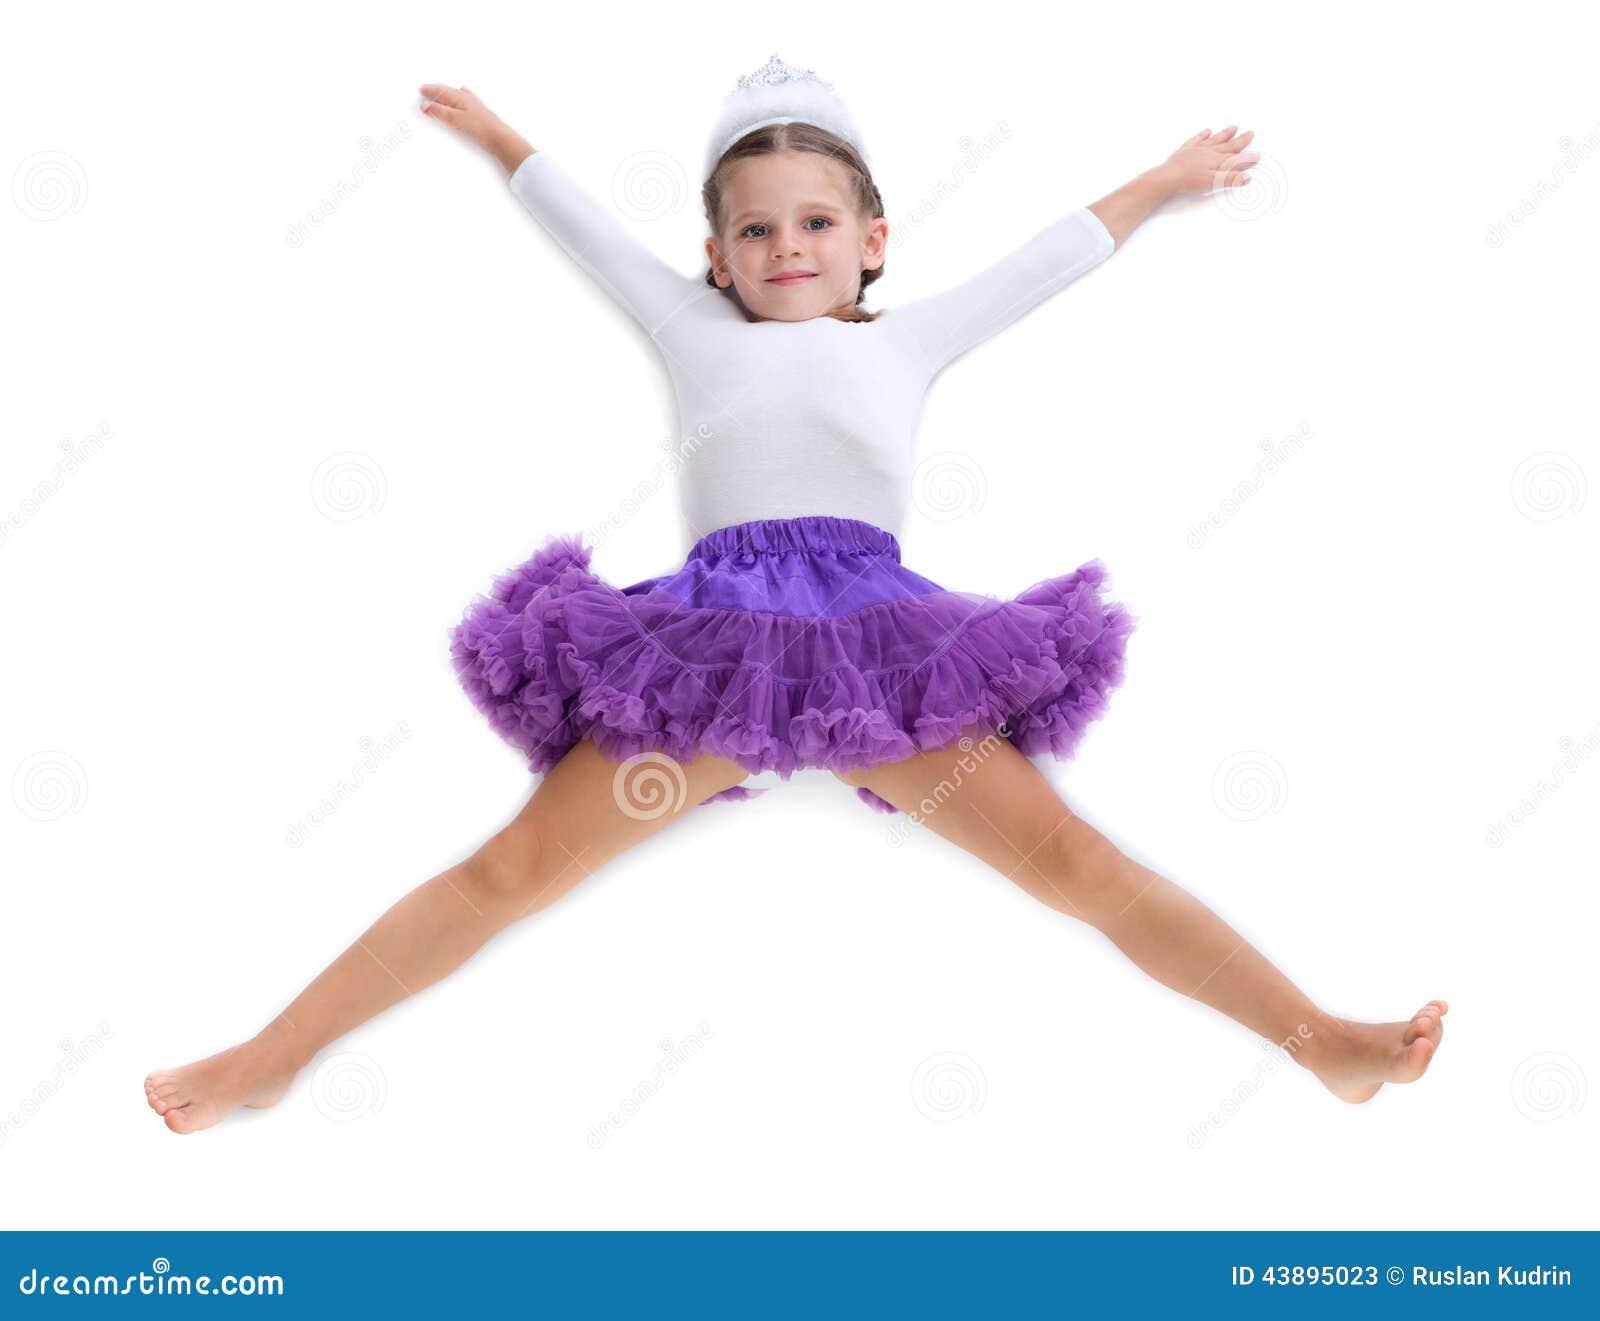 Little Girl Ballerina Stock Image Image Of Cheerful